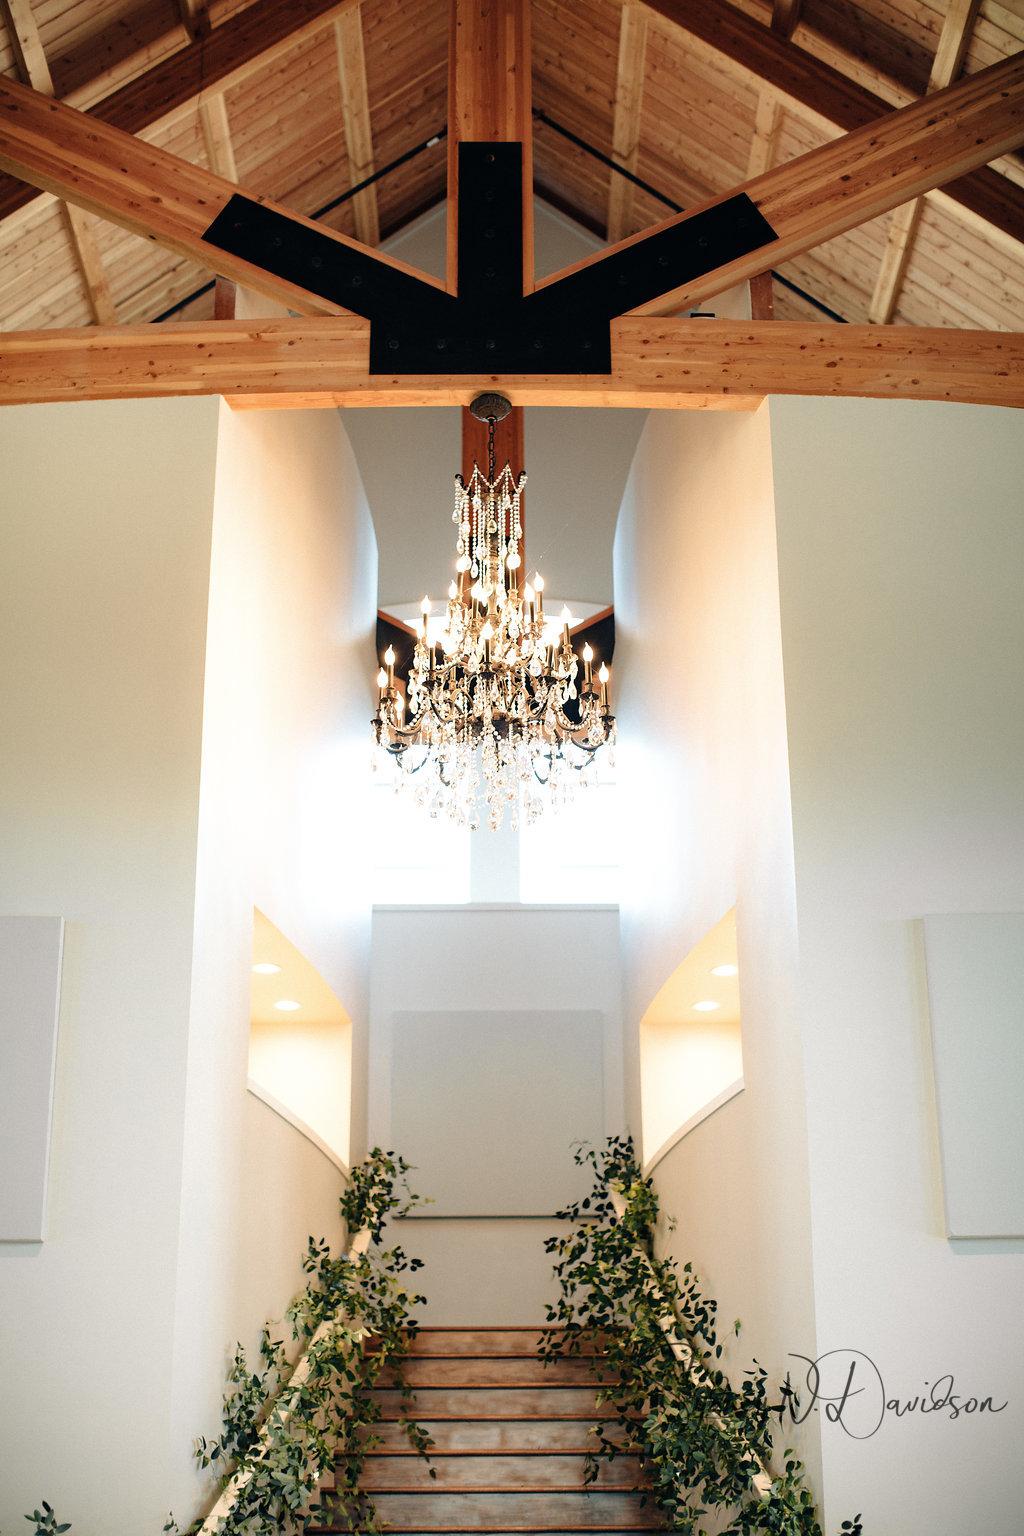 sydney-davidson-wedding-stillwater-oklahoma-wedding-session-traveling-photographer-portrait-tulsa-oklahoma-2520.jpg